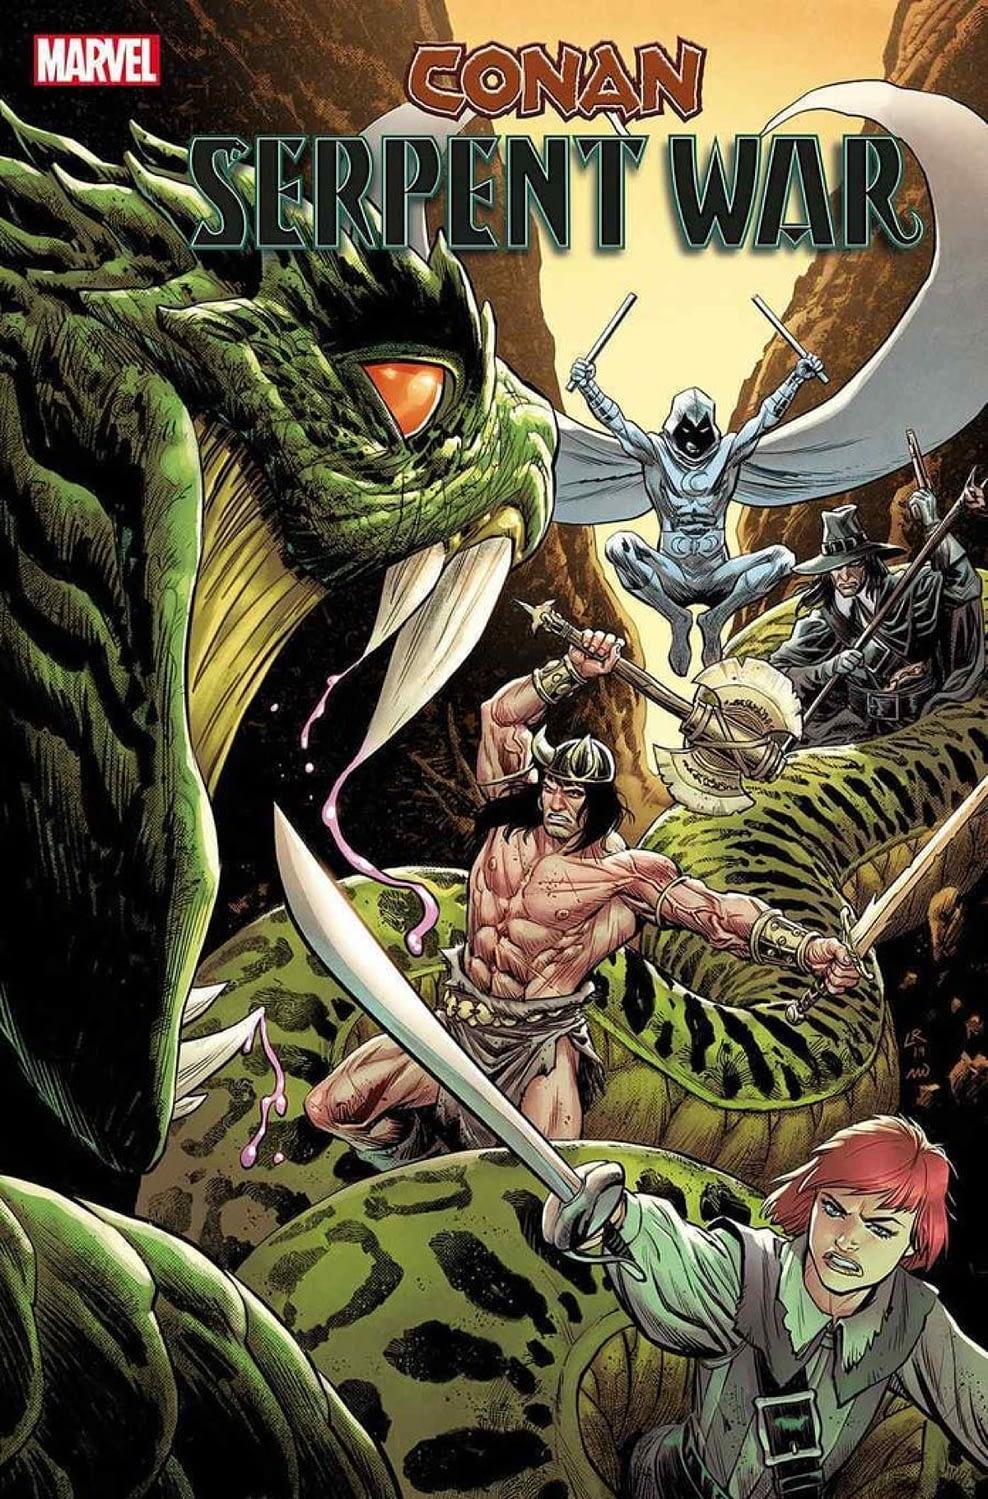 Serpent War: Conan Crosses Over With Moon Knight in Dece